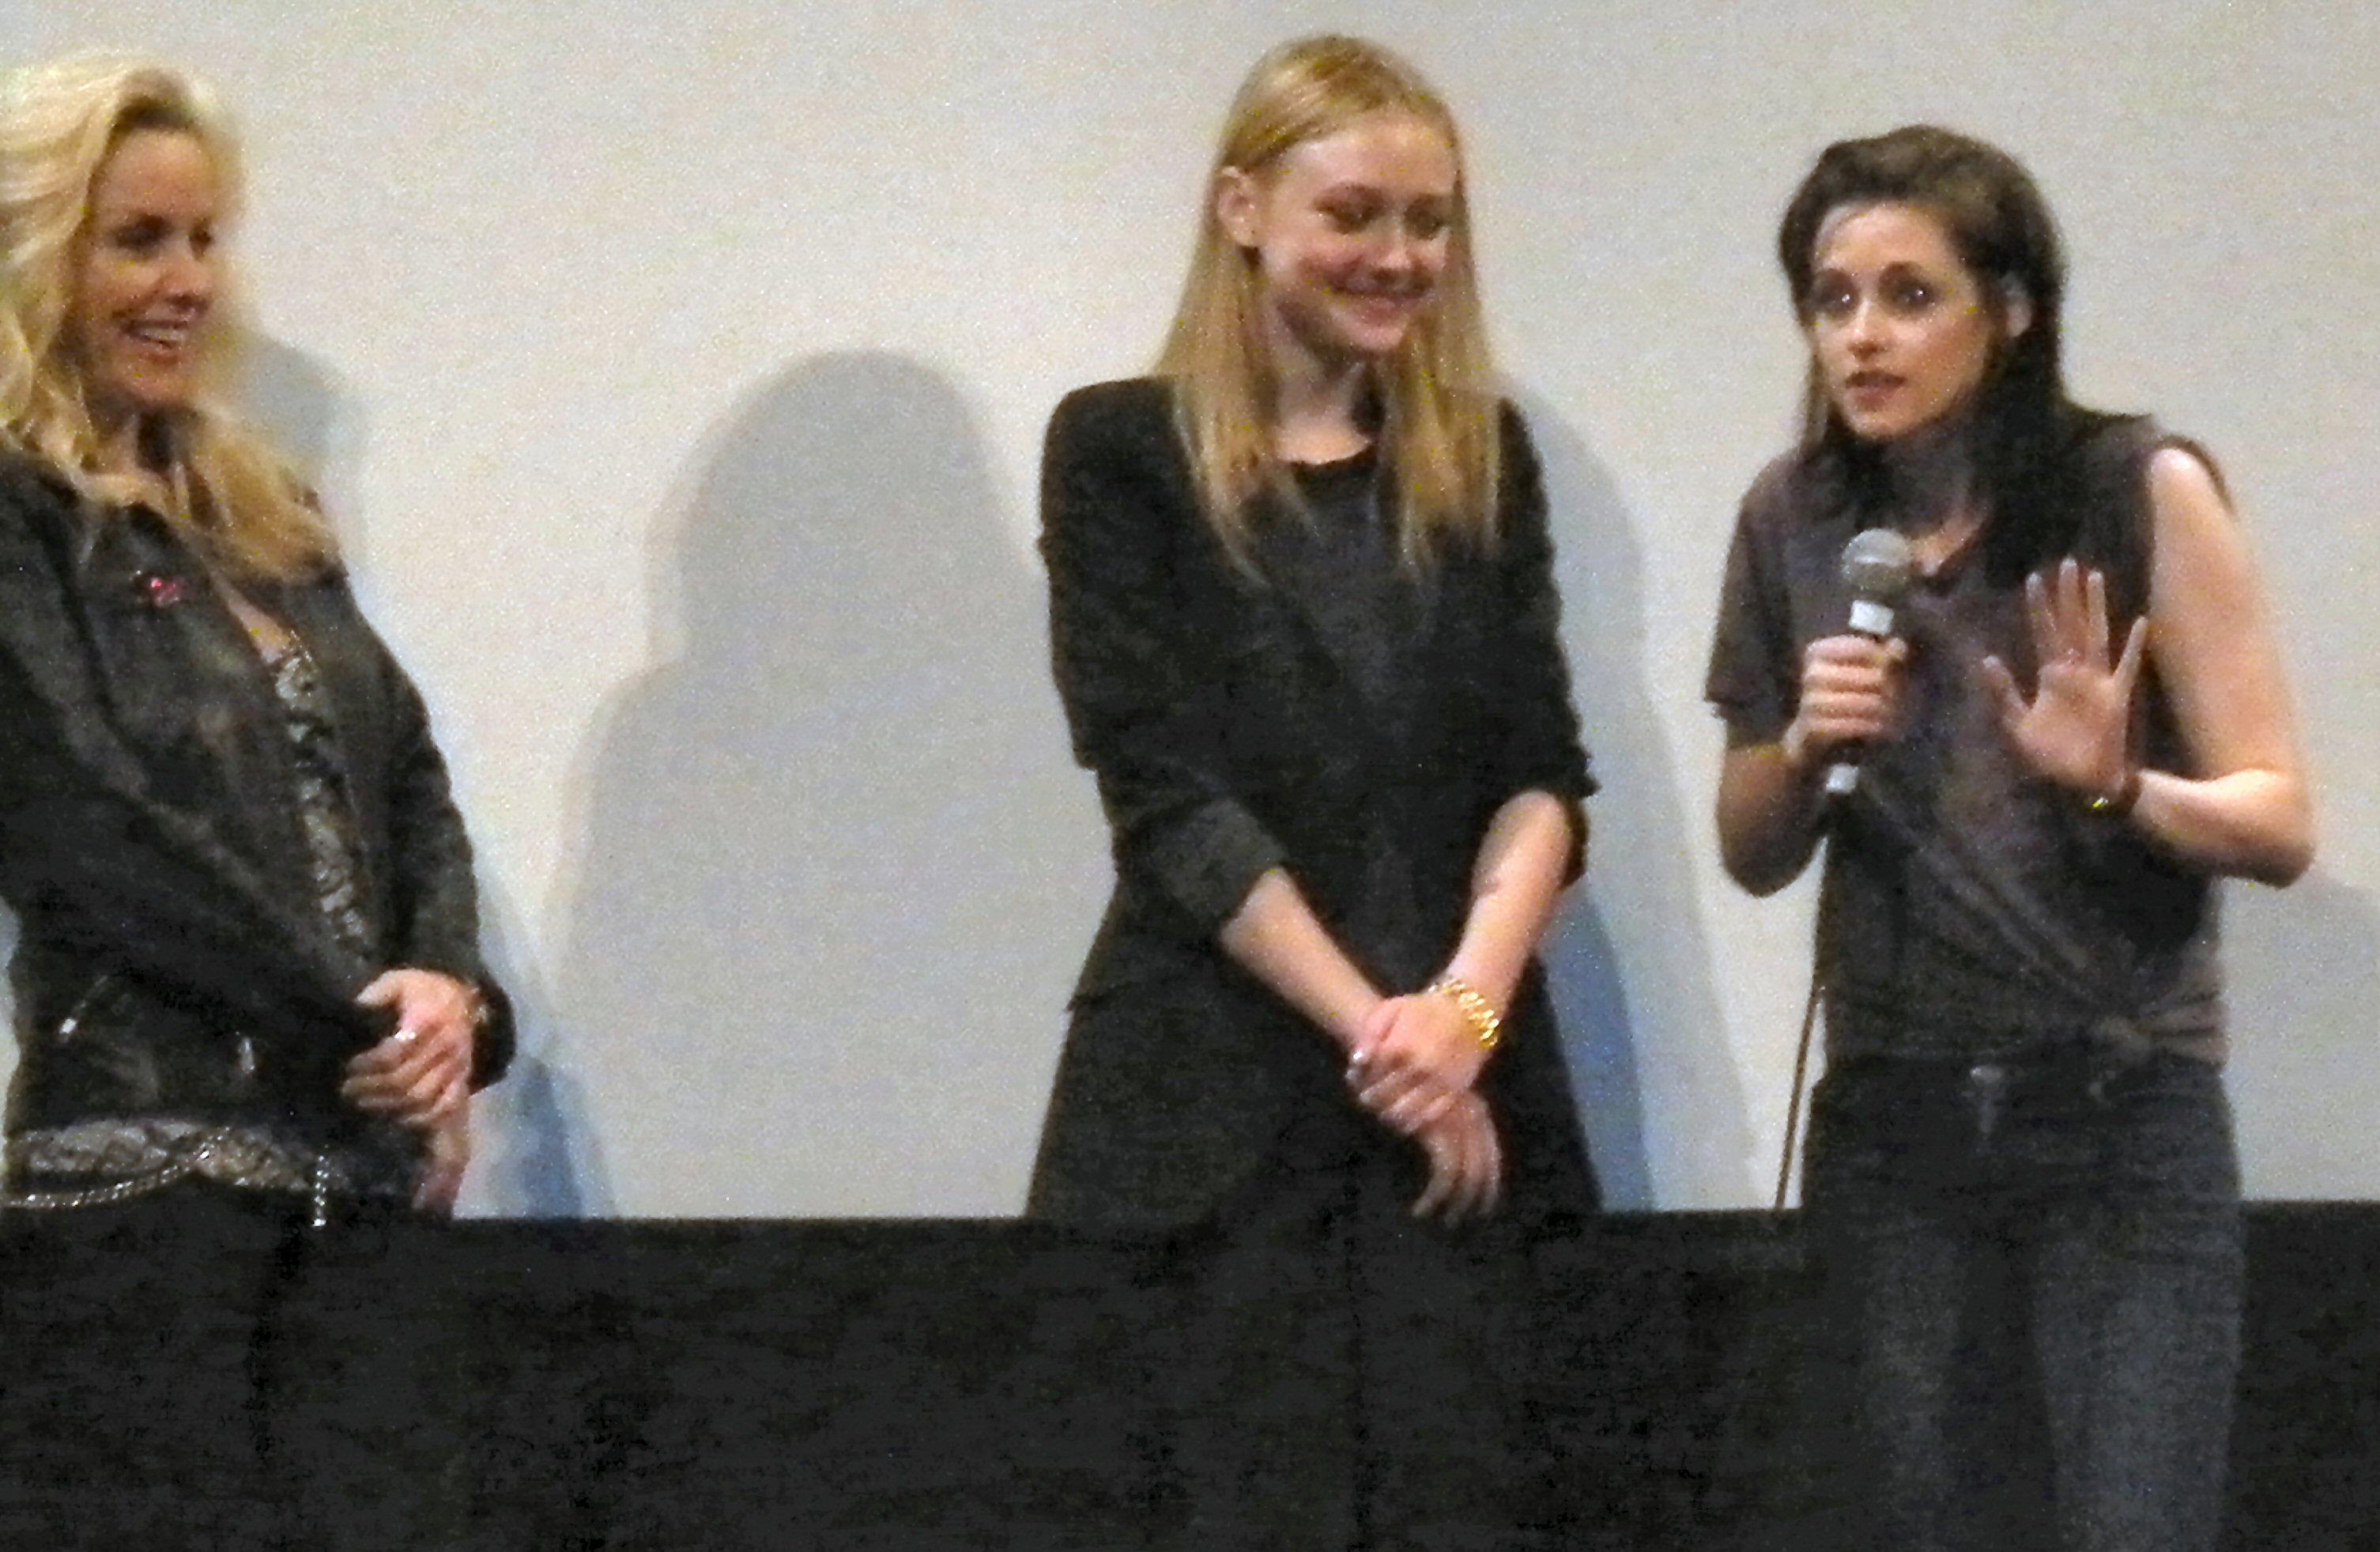 FileCherie Currie Dakota Fanning Kristen Stewart 9jpg